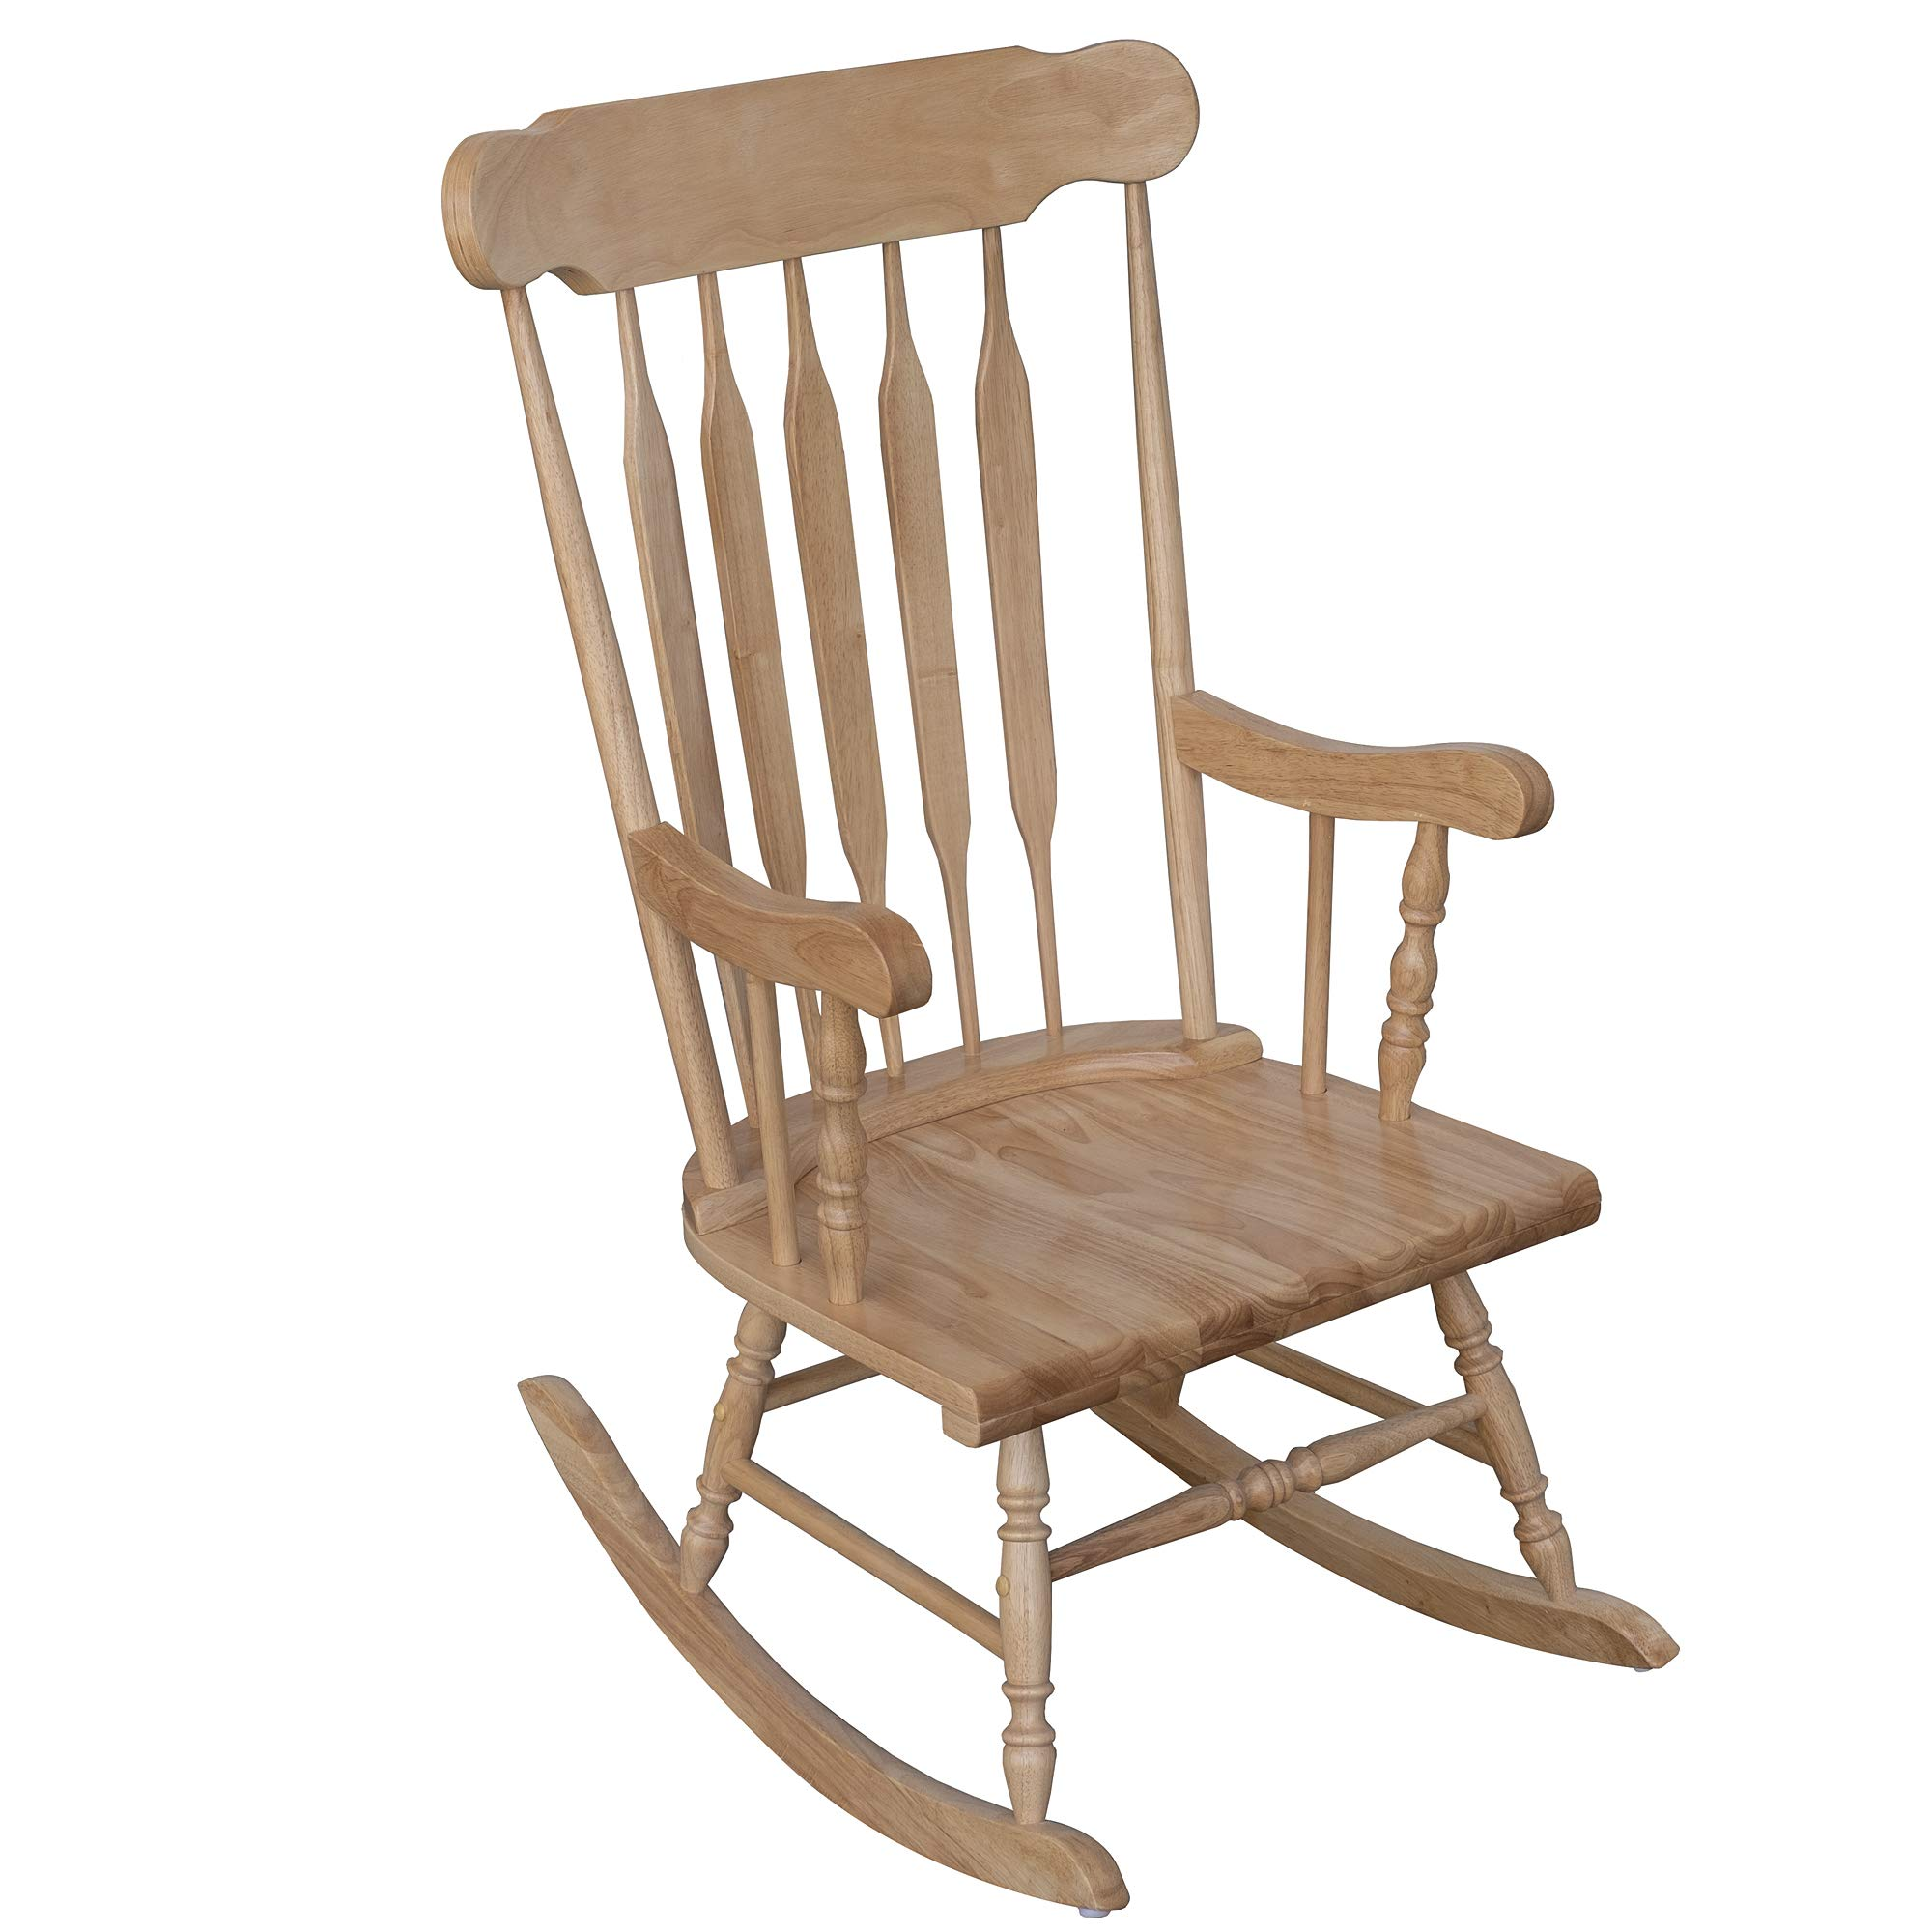 HOMCOM Wooden Baby Nursery Rocking Chair - Brown